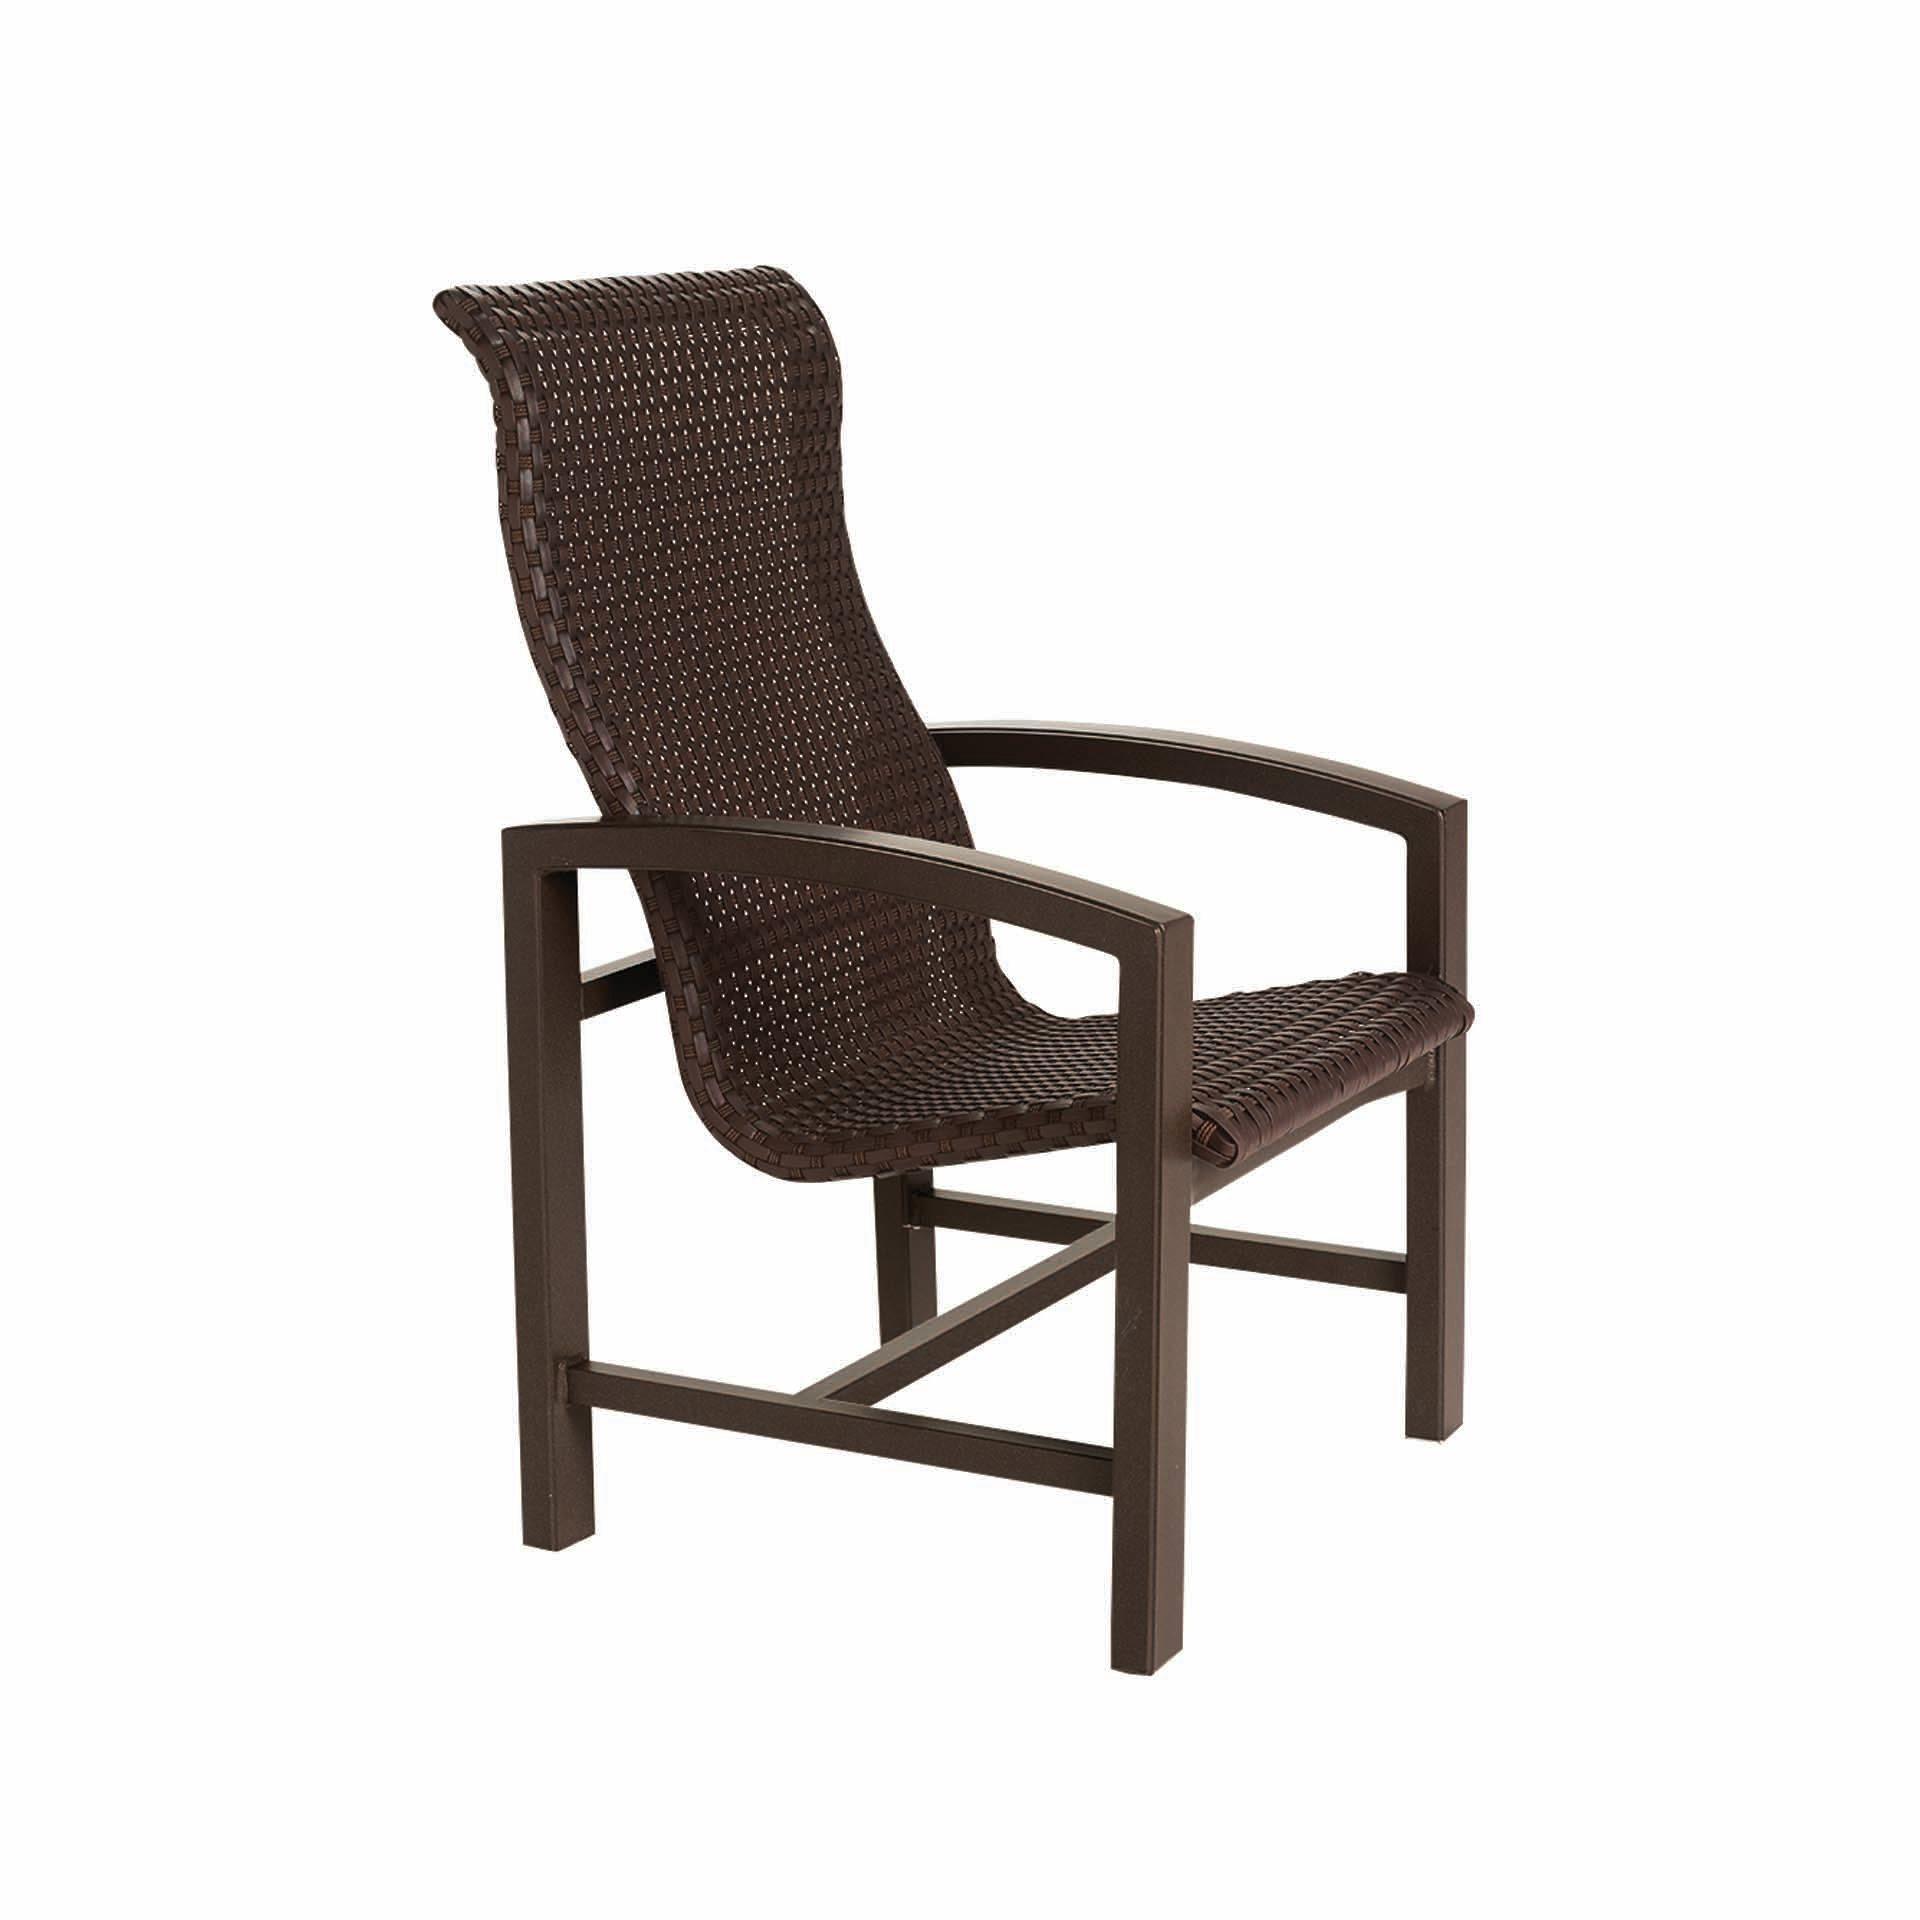 American Leisure Patio Furniture Santa Cruz Ca: Tropitone Lakeside Woven High Back Dining Chair